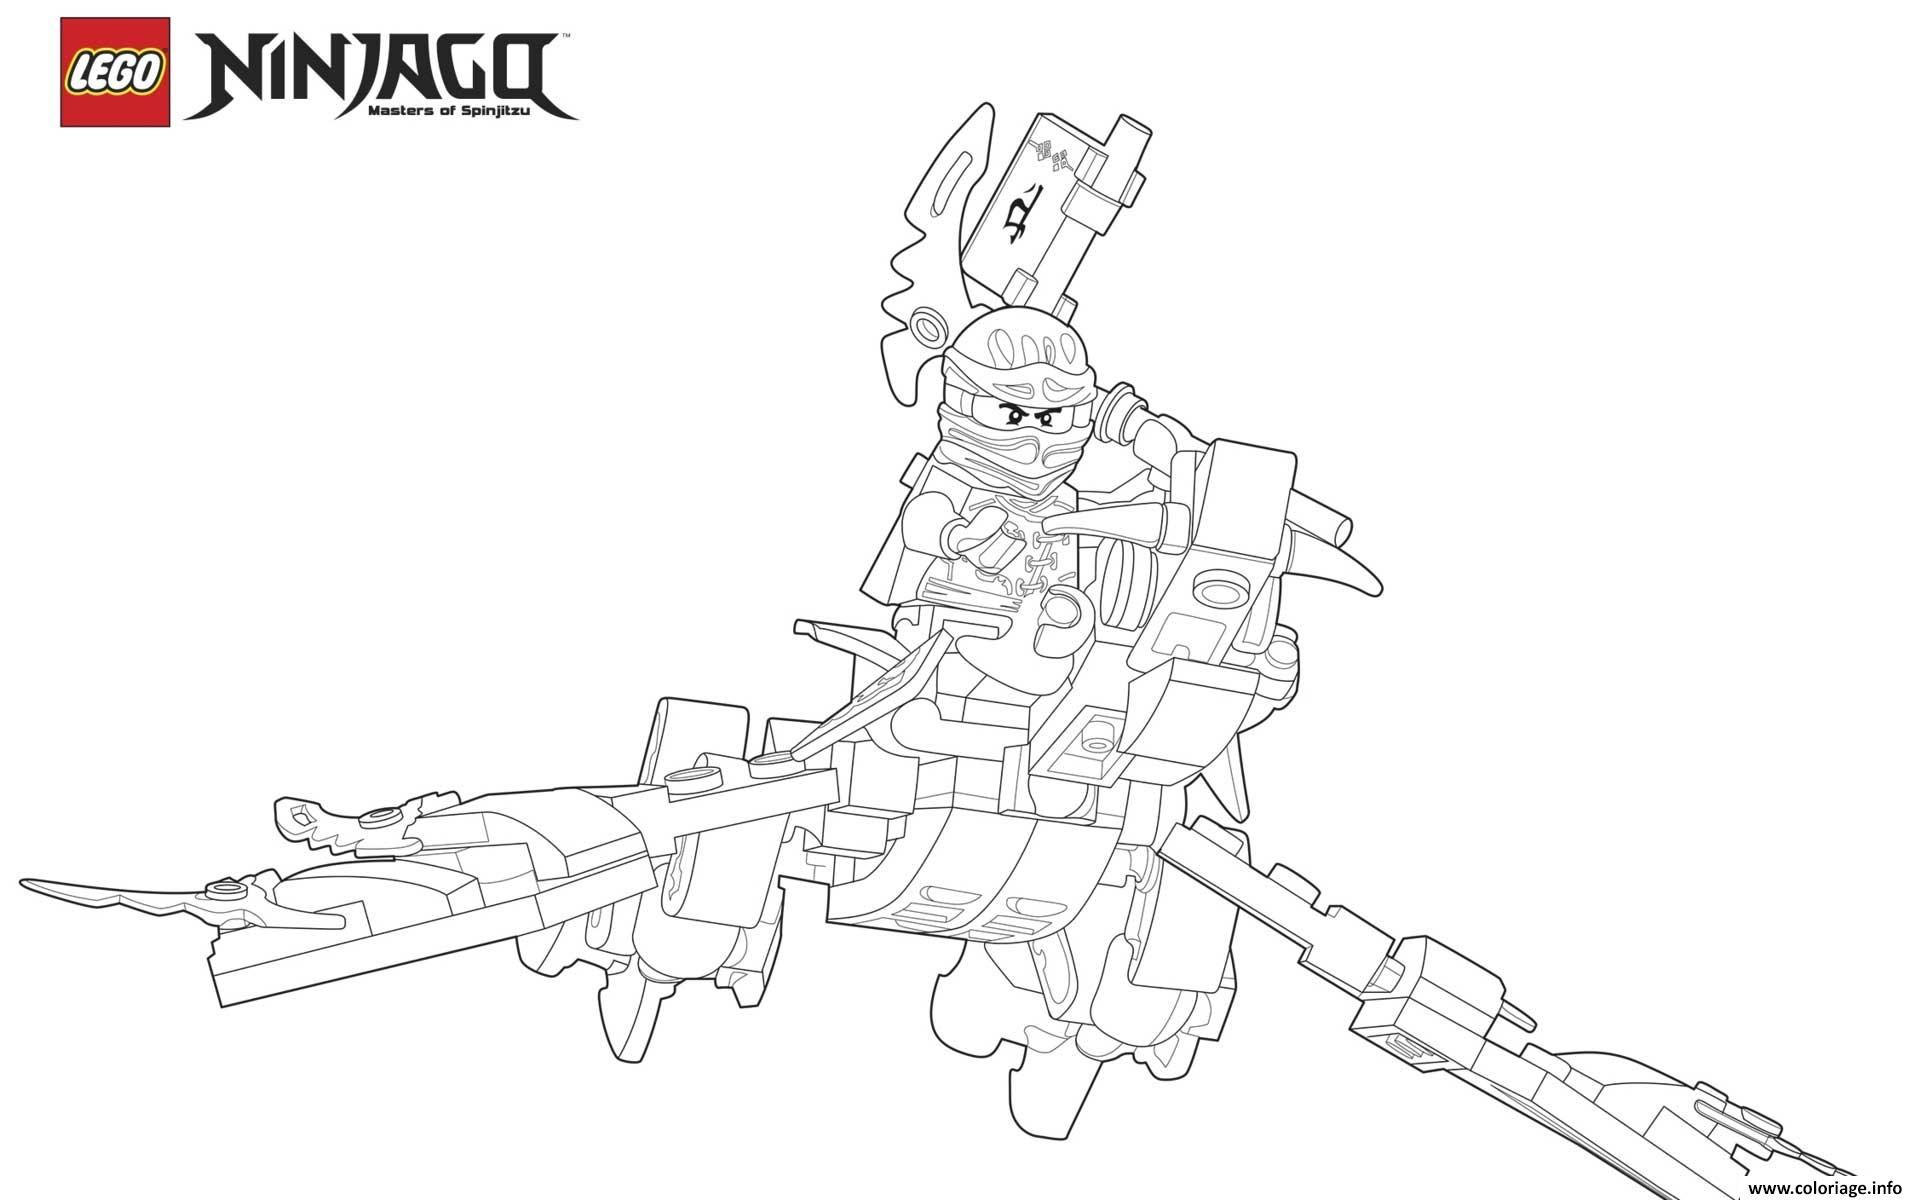 Dessin ninjago lego sur un dragon qui vole Coloriage Gratuit à Imprimer